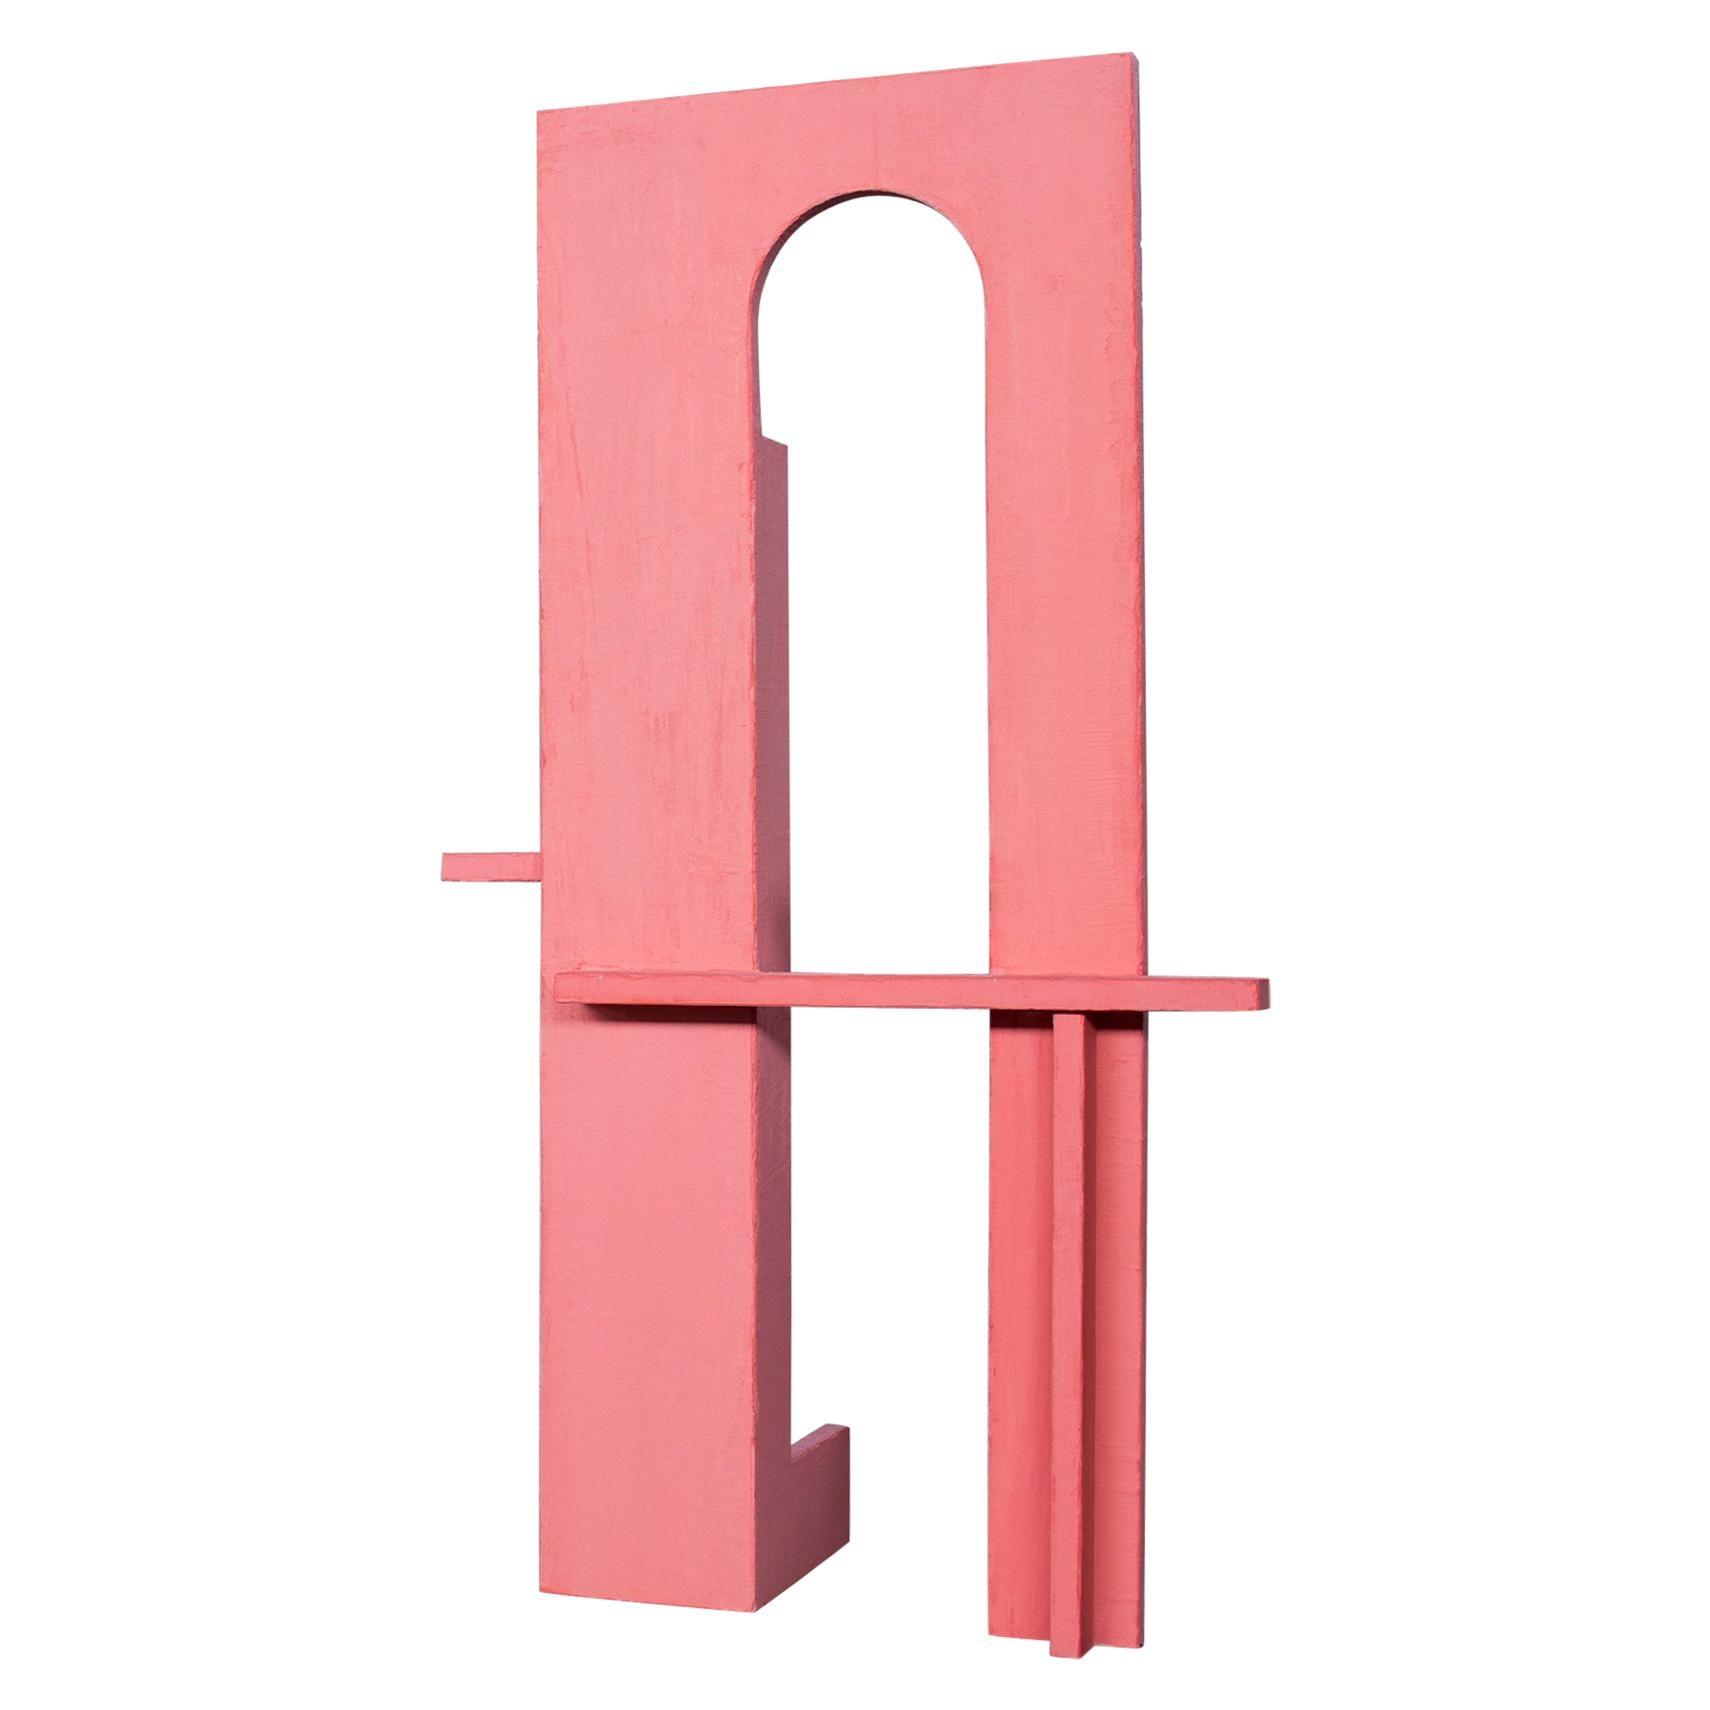 Space Poetry Pink Room divider